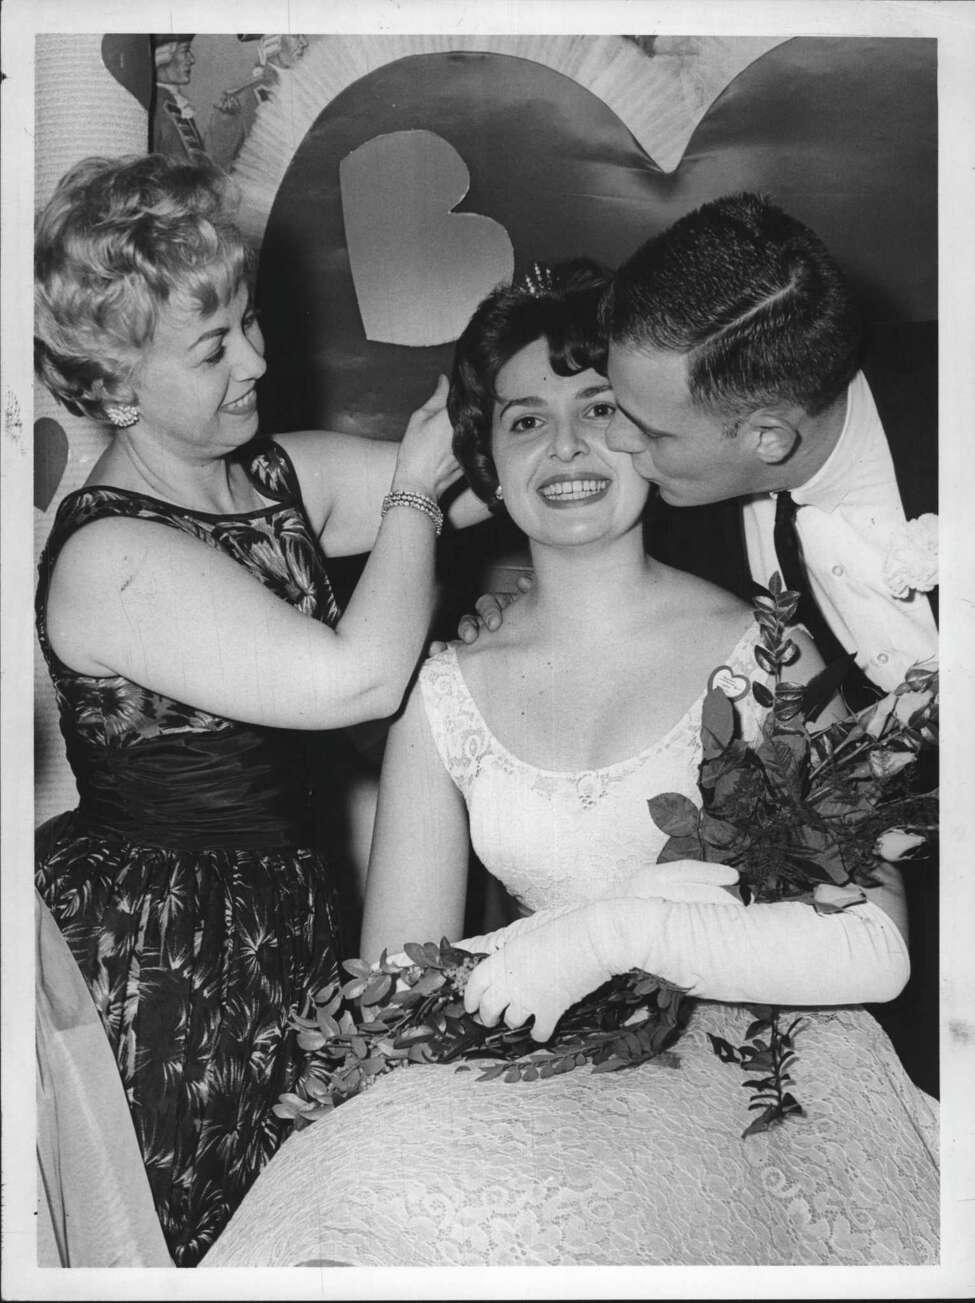 Crossroads Restaurant, Latham, New York - Valentine Queen, Beta Sigma Phi - Miss Carol Bratton, Chairman of Affair, Mrs. Jan Holick, Queen, Jan Holick Undated (husband). February 21, 1962 (Thomas Sheehan/Times Union Archive)